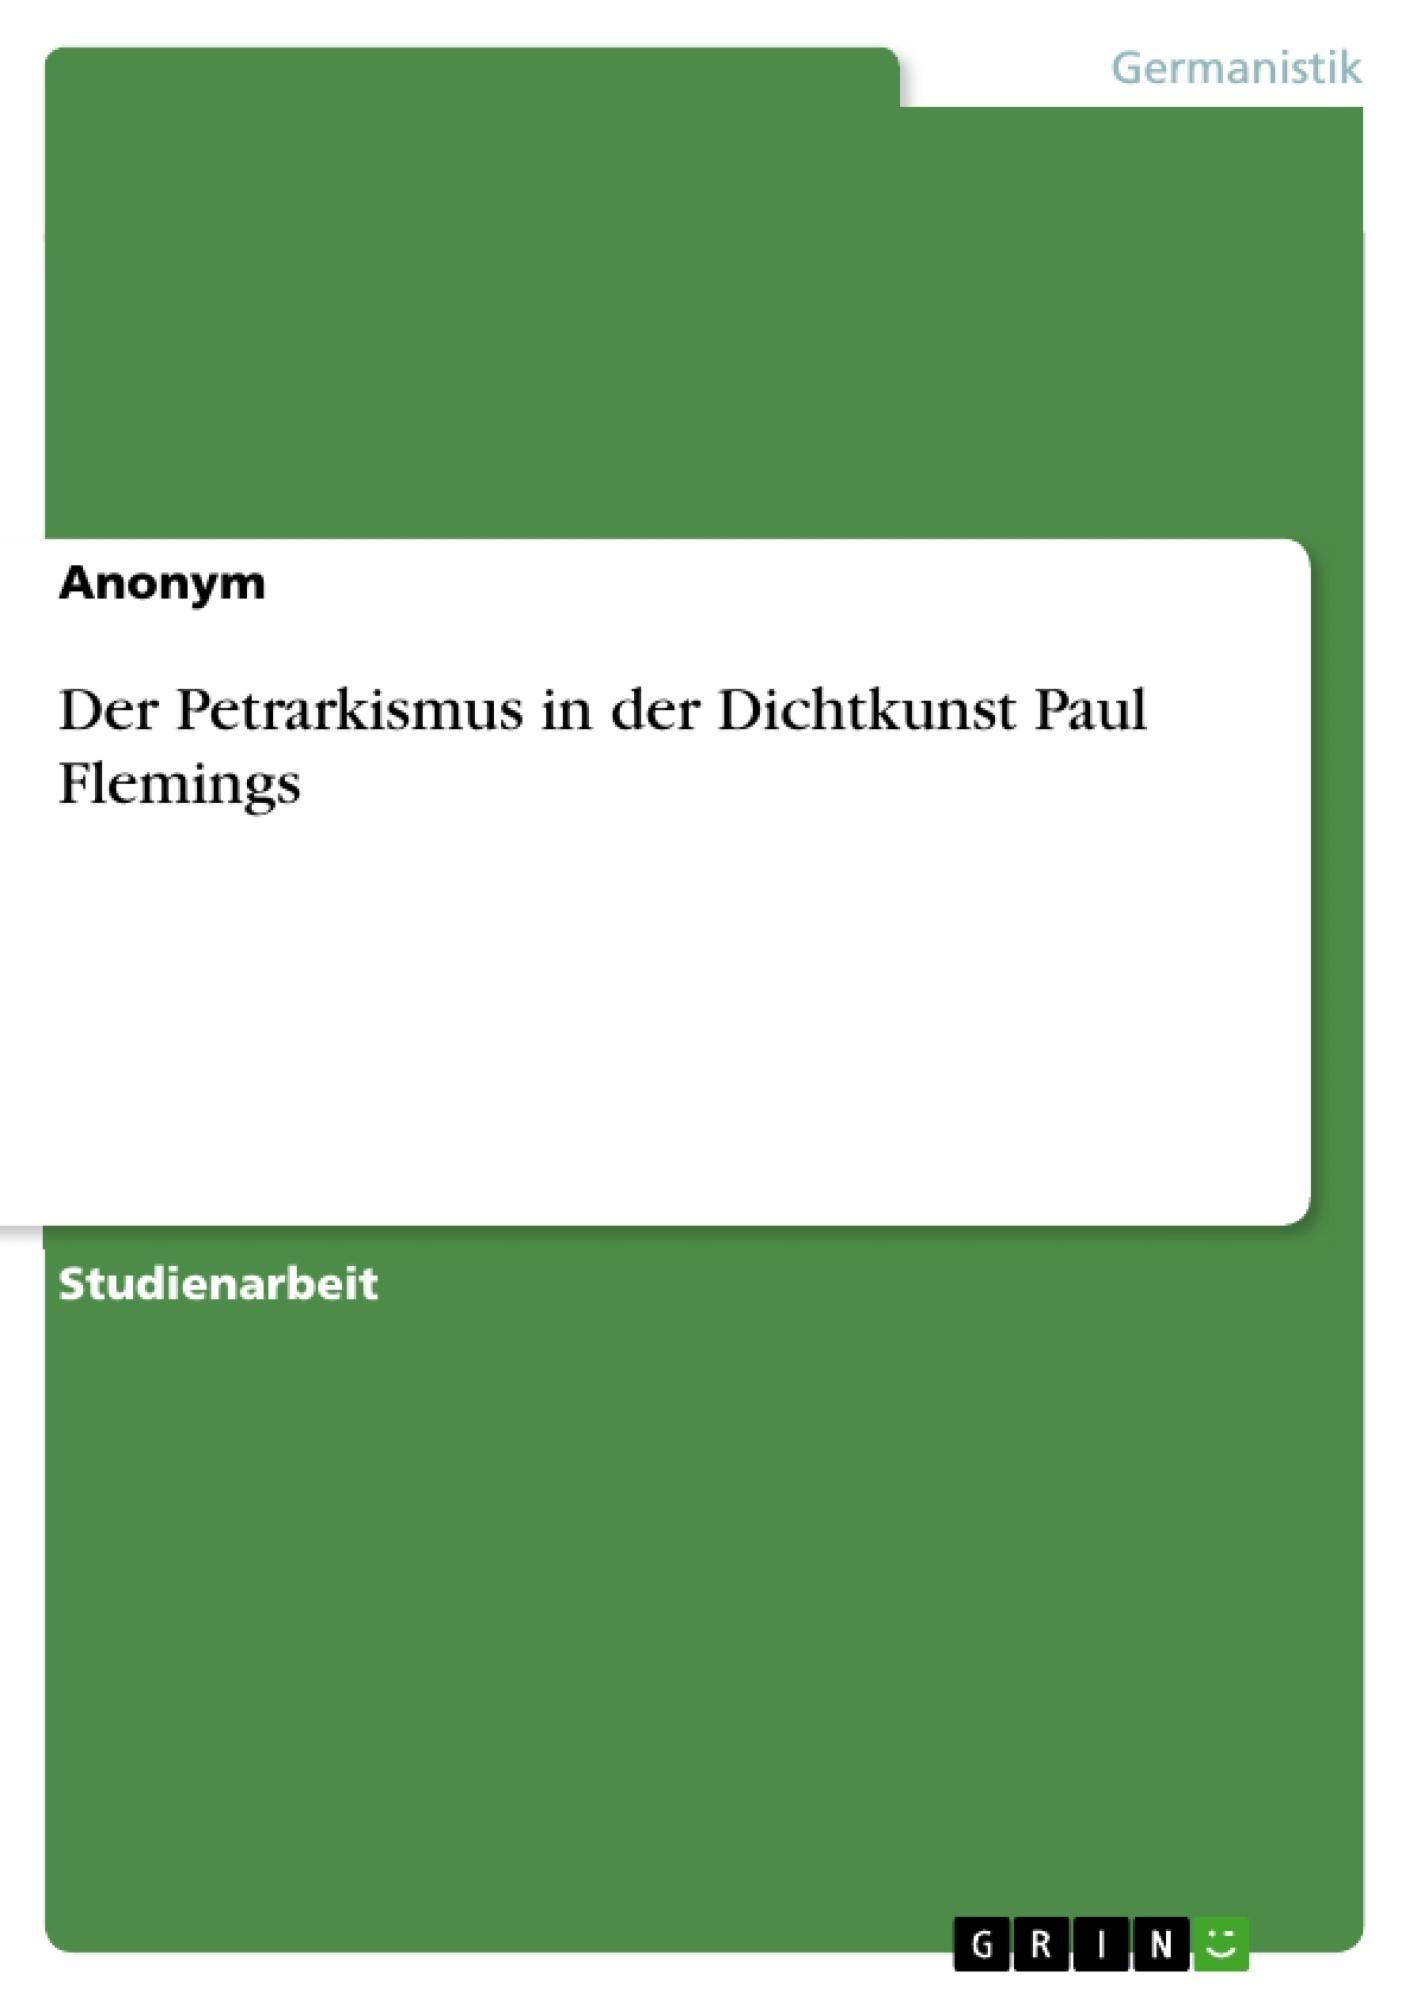 Titel: Der Petrarkismus in der Dichtkunst Paul Flemings